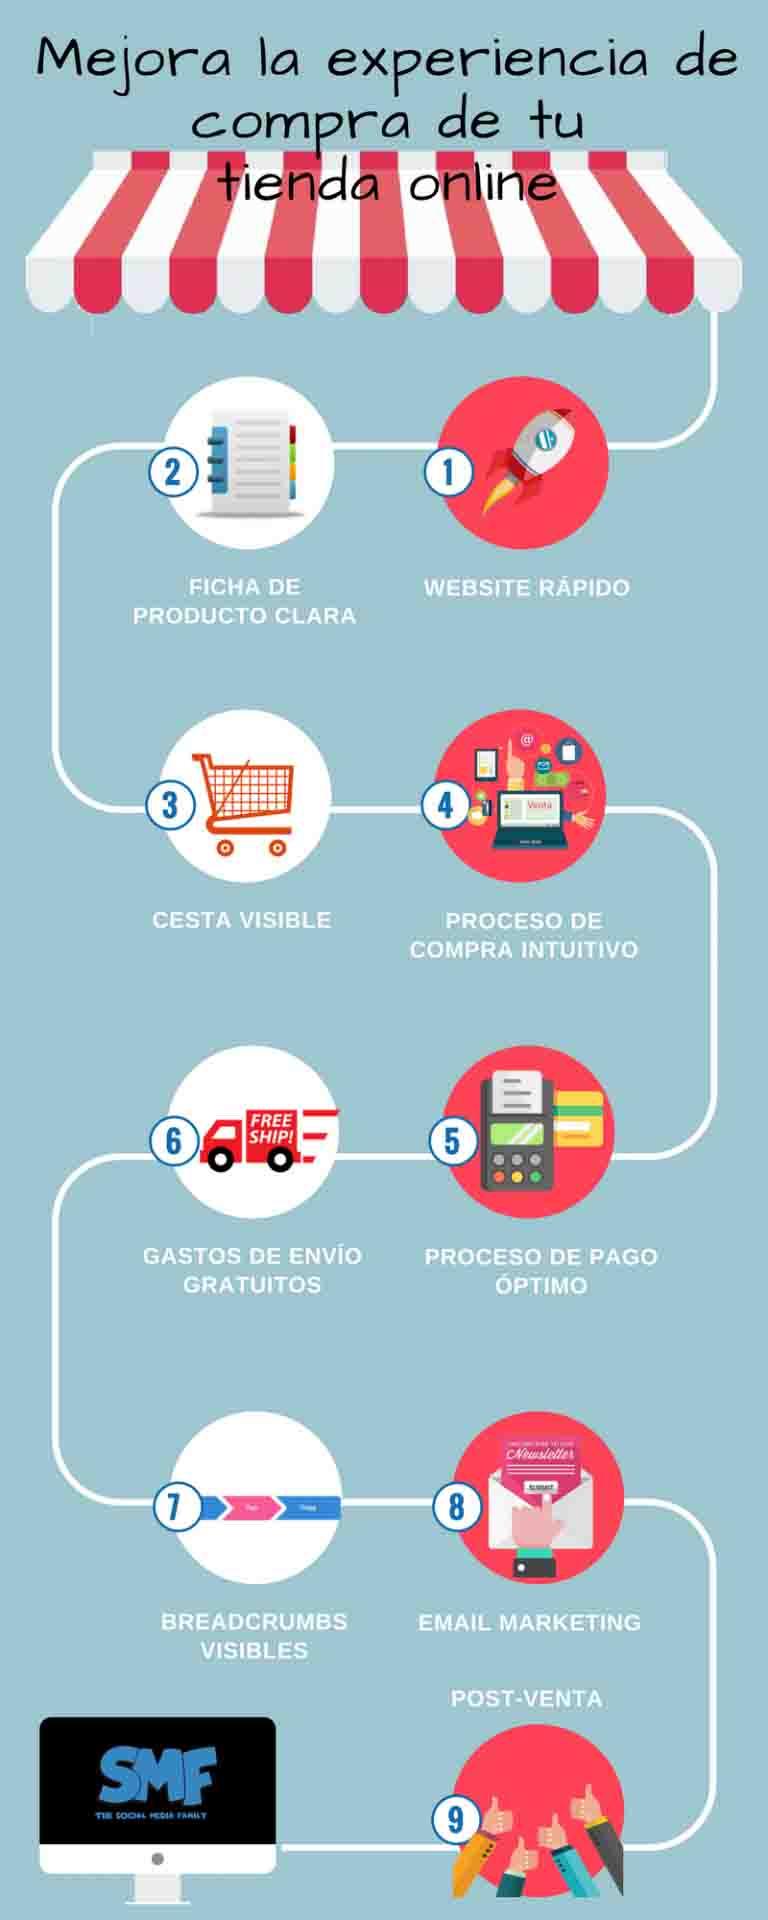 infografa-mejorar-experienda-compra-tienda-online